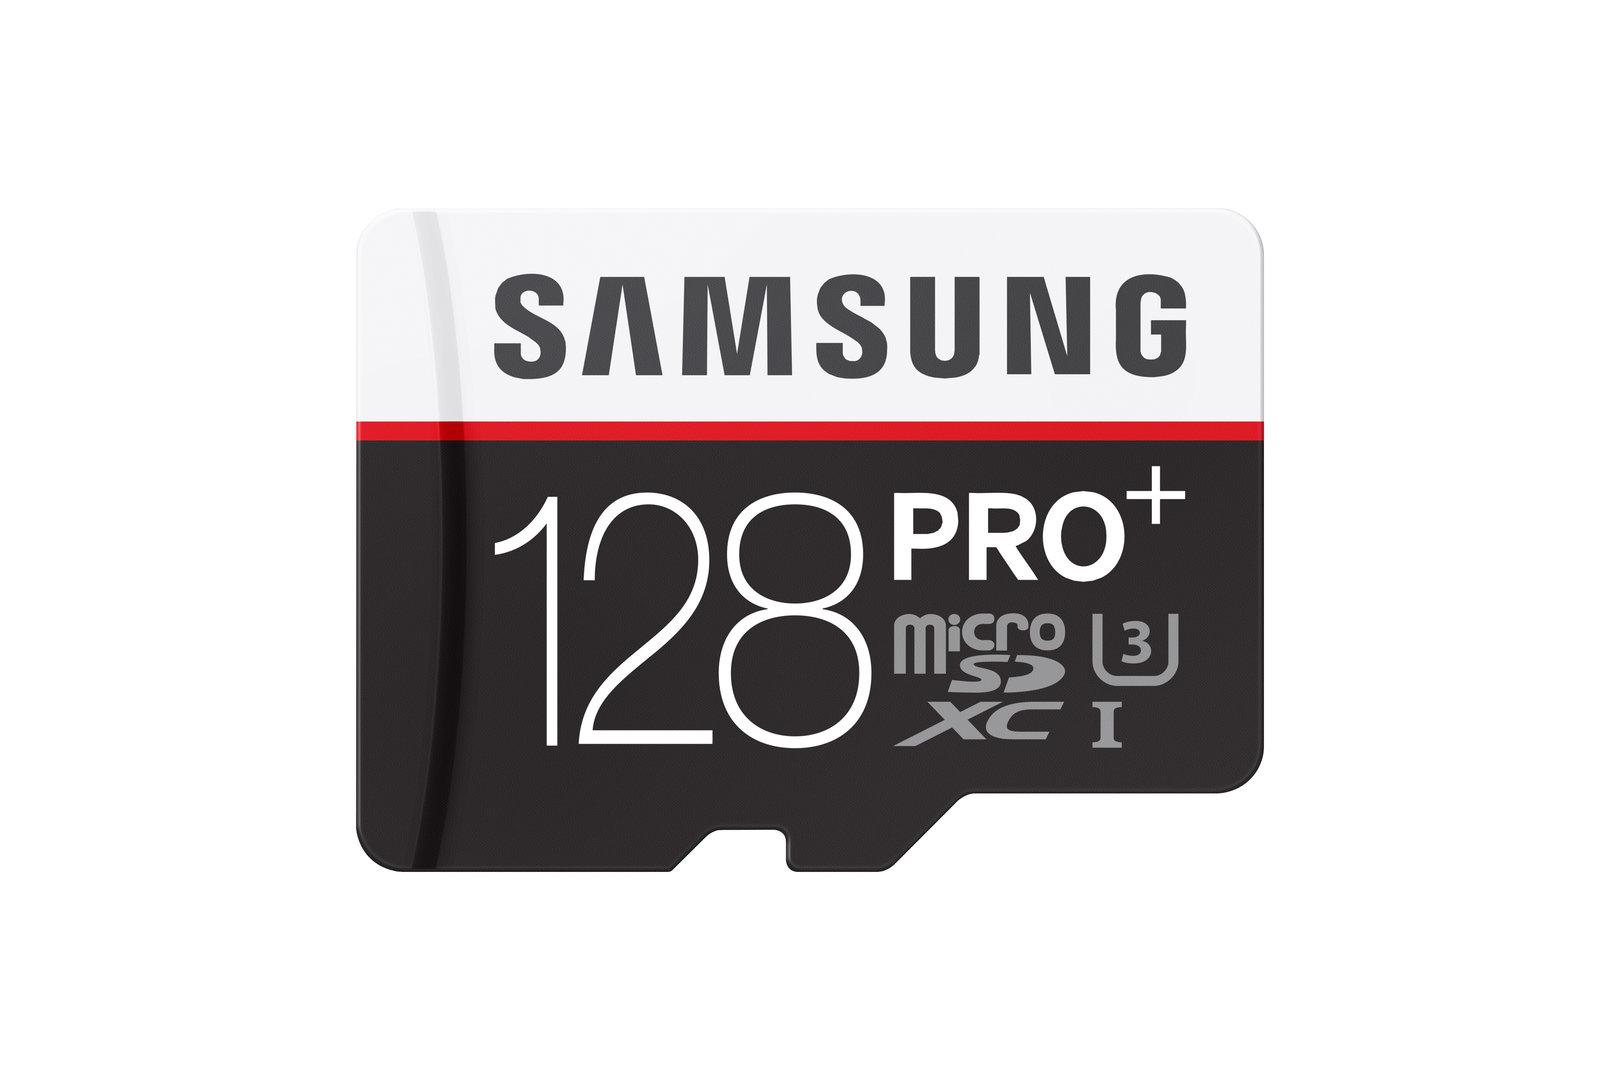 Samsung Pro Plus microSD 128 GB